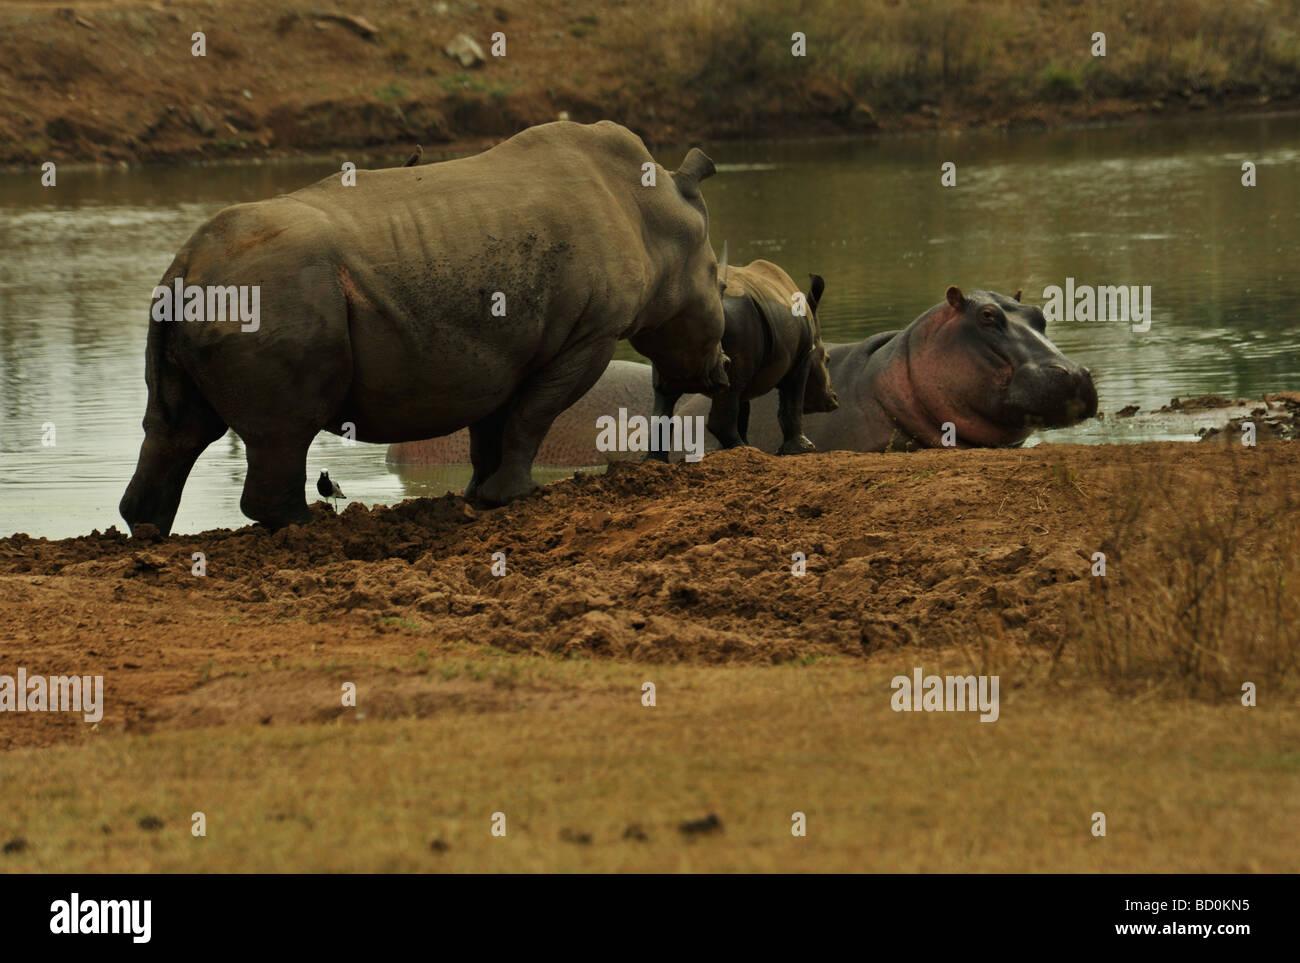 Royal Hlane National Park, Swaziland, White Rhino, Ceratotherium simum, female and calf interacting, Hippo, Hippopotamus Stock Photo